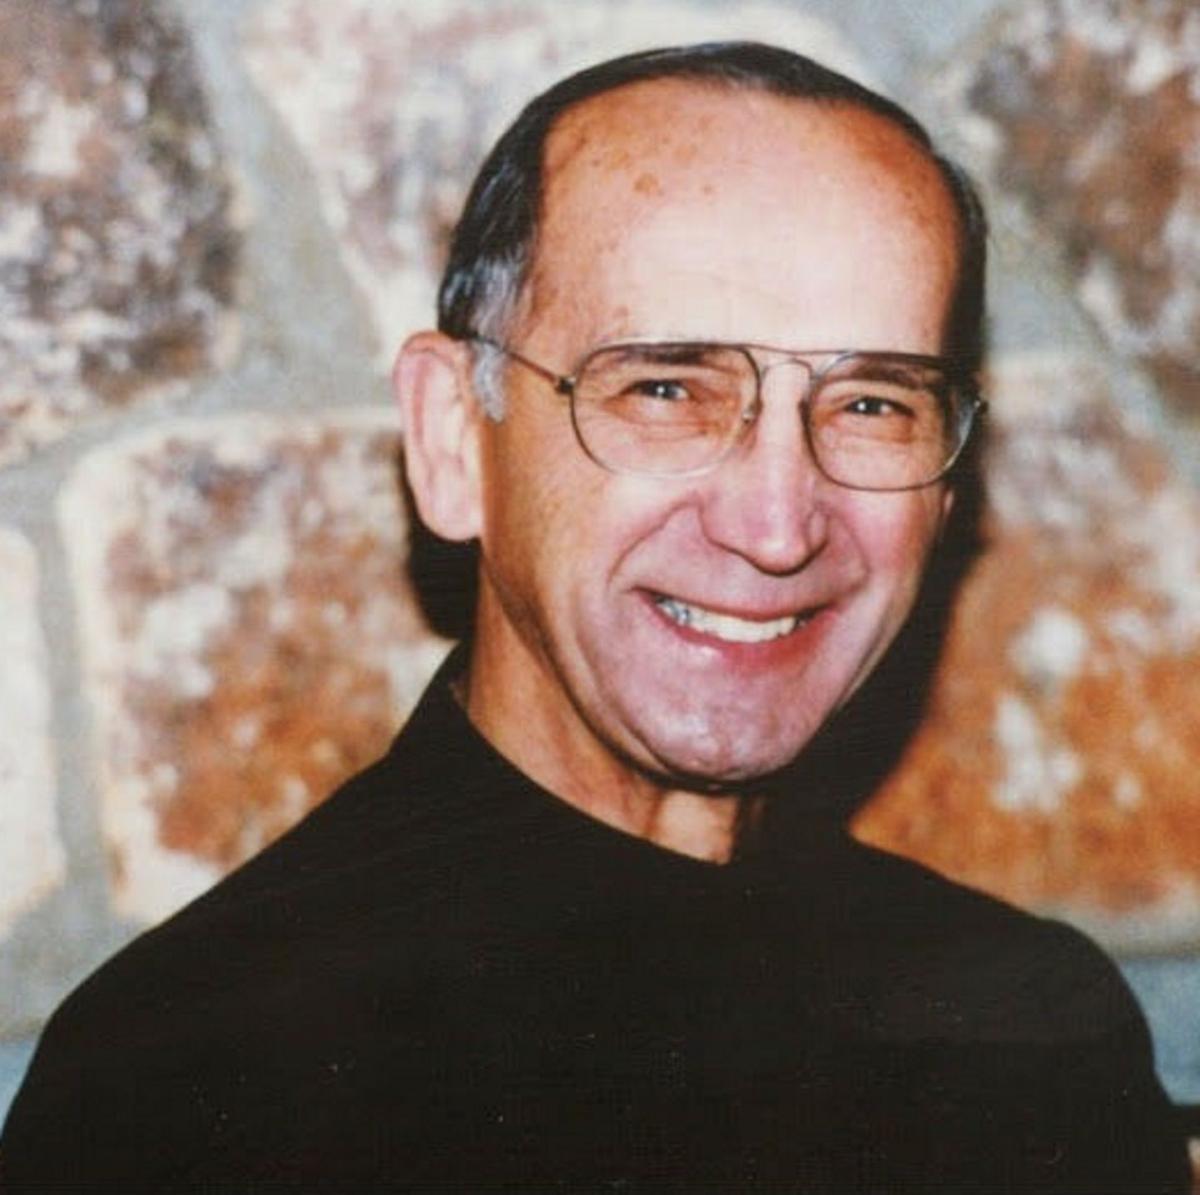 BROTHER MARTIN PACHOLEK